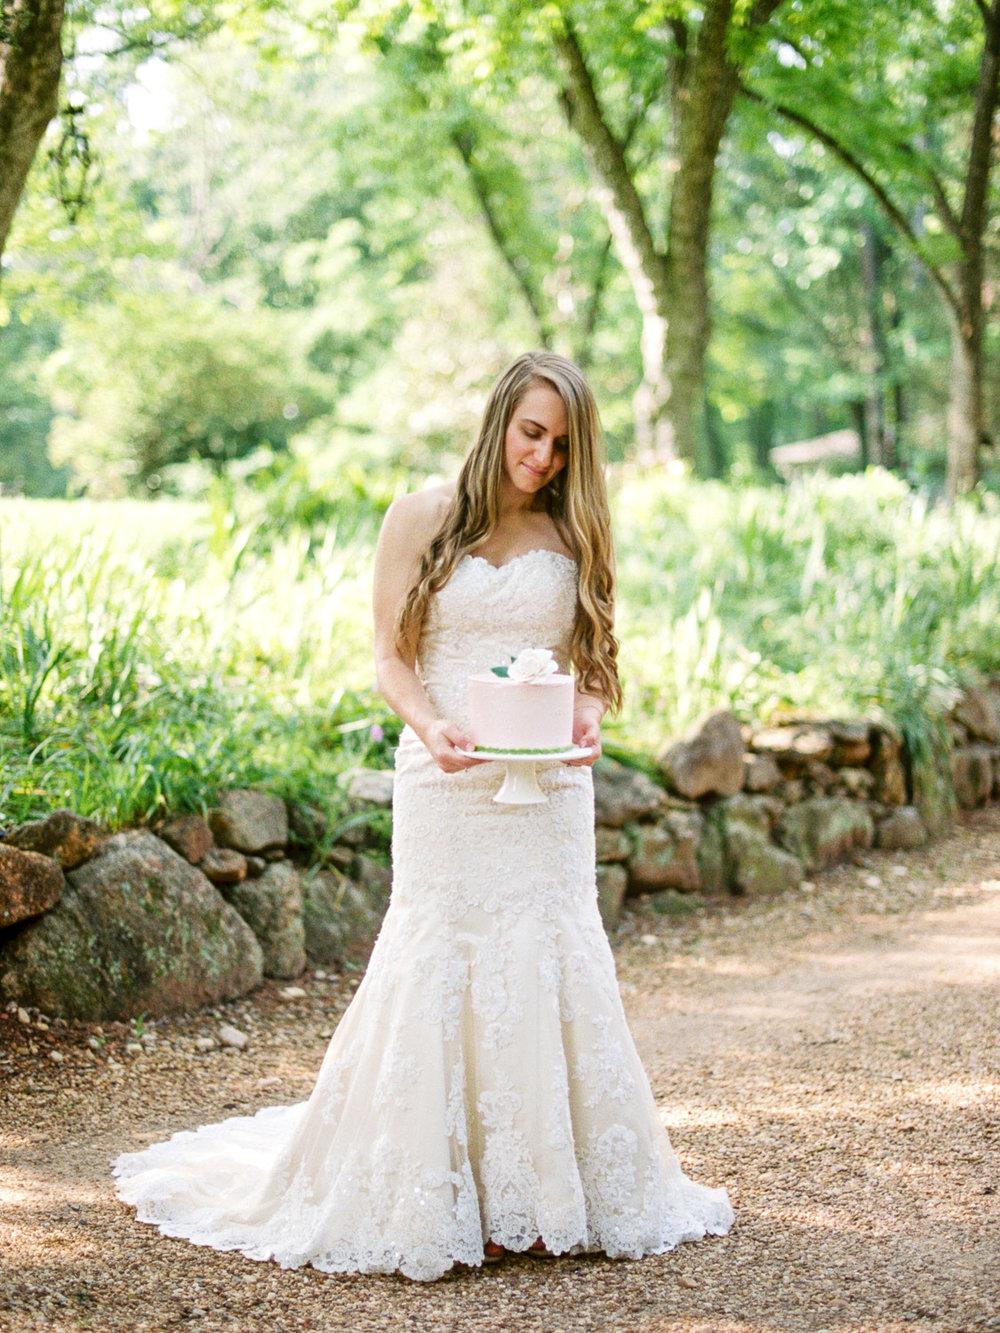 christinadavisphotography-romanticwedding-gardenweddinginspiration56.jpg